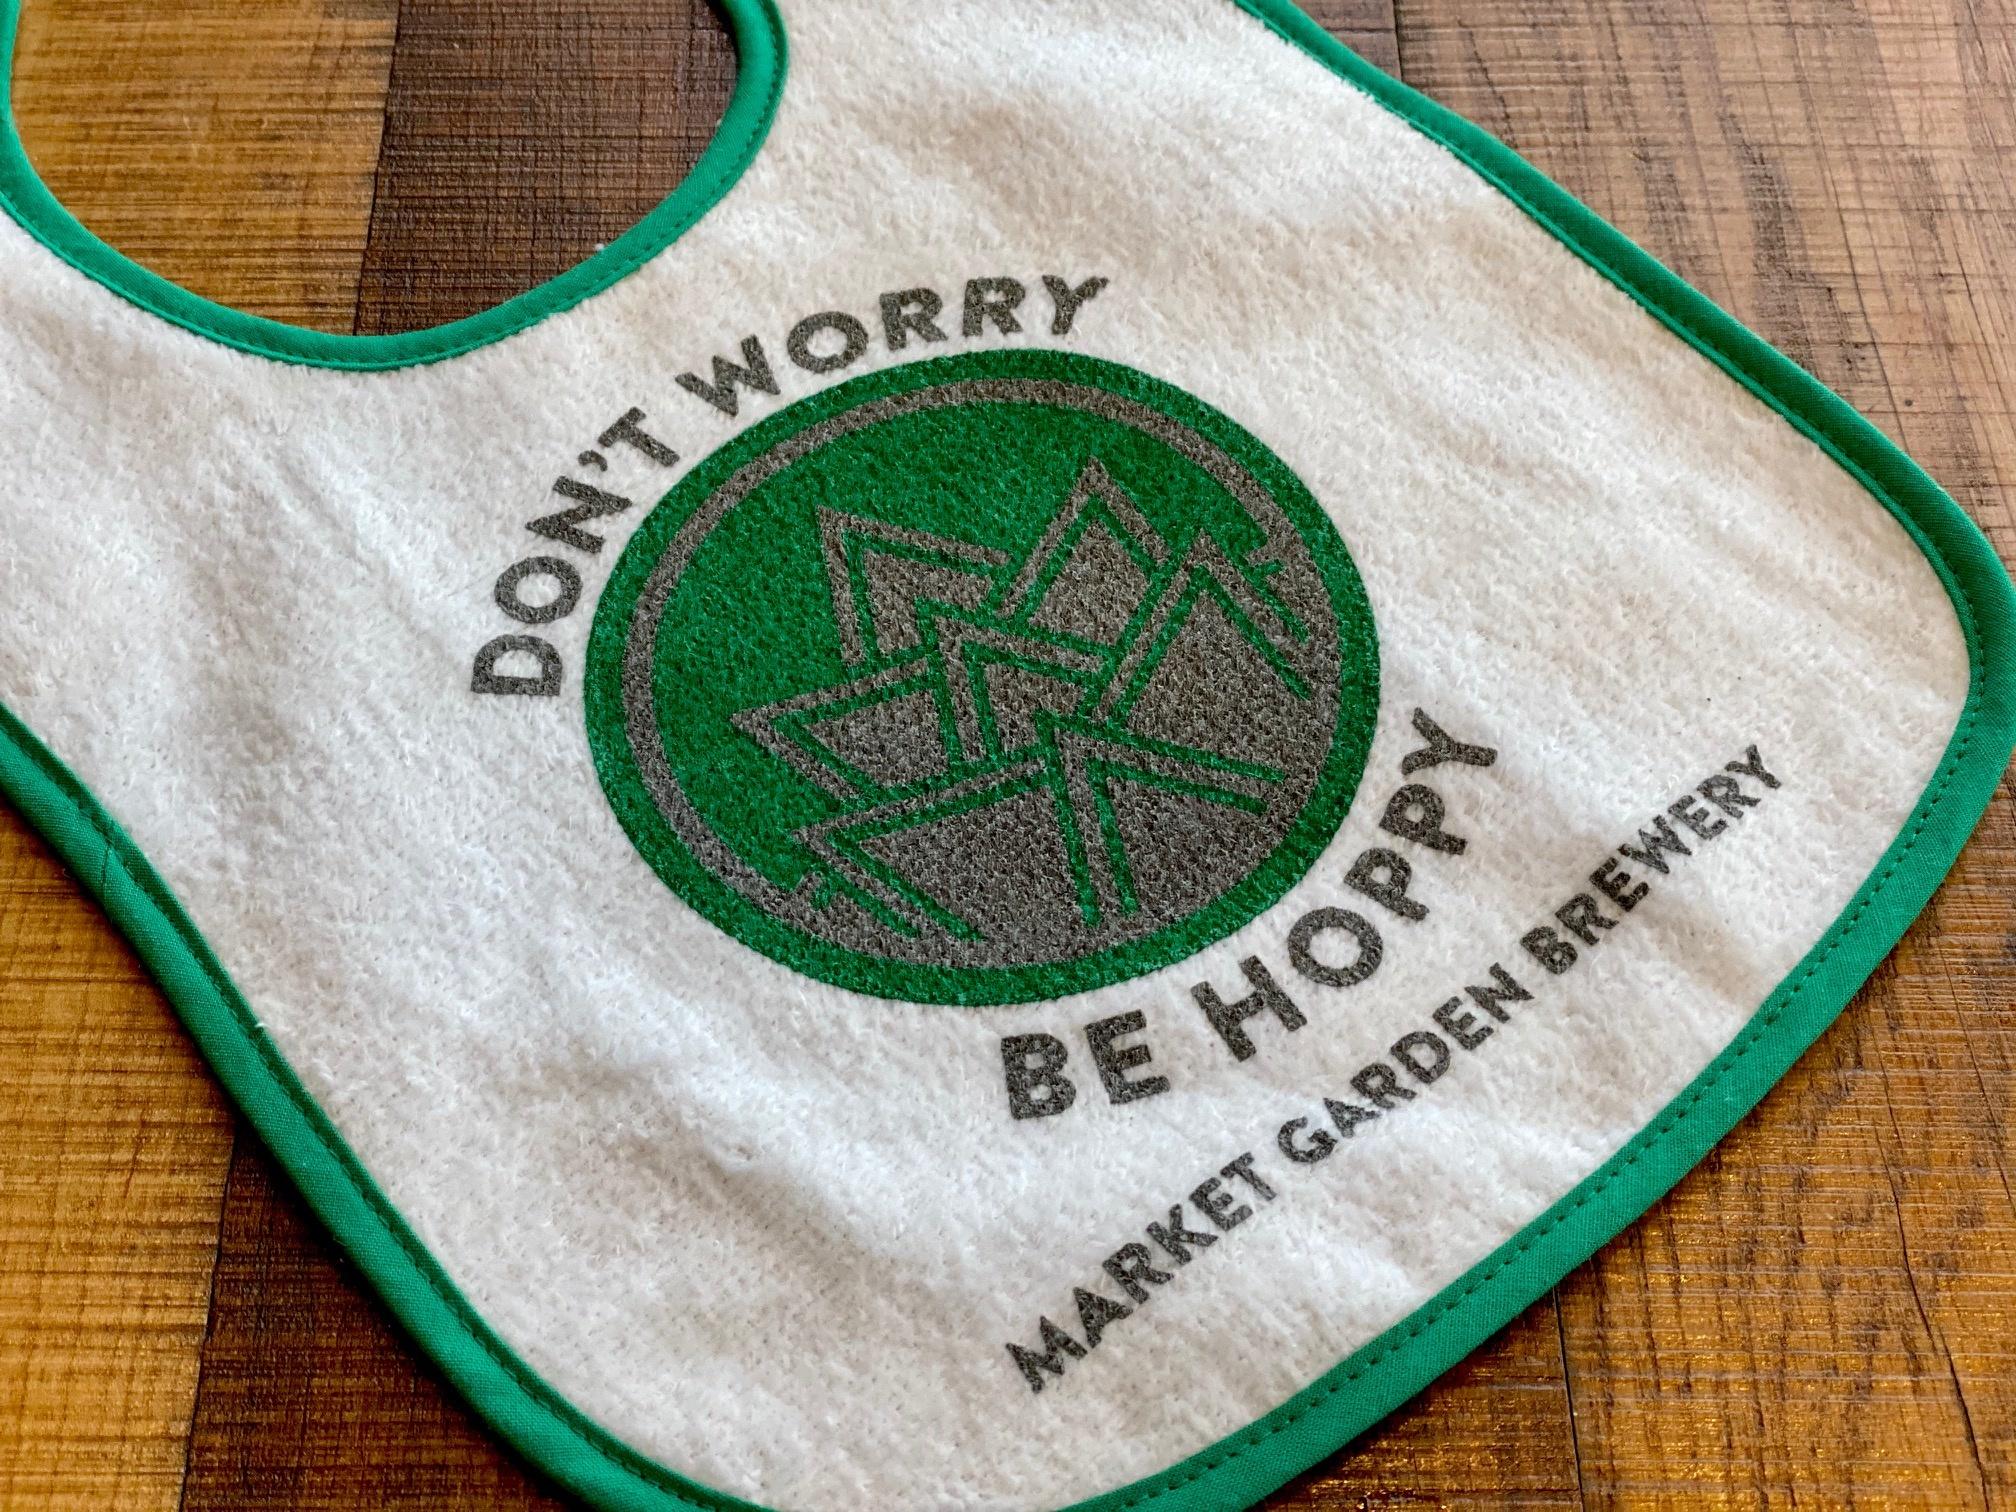 Be Hoppy Bib